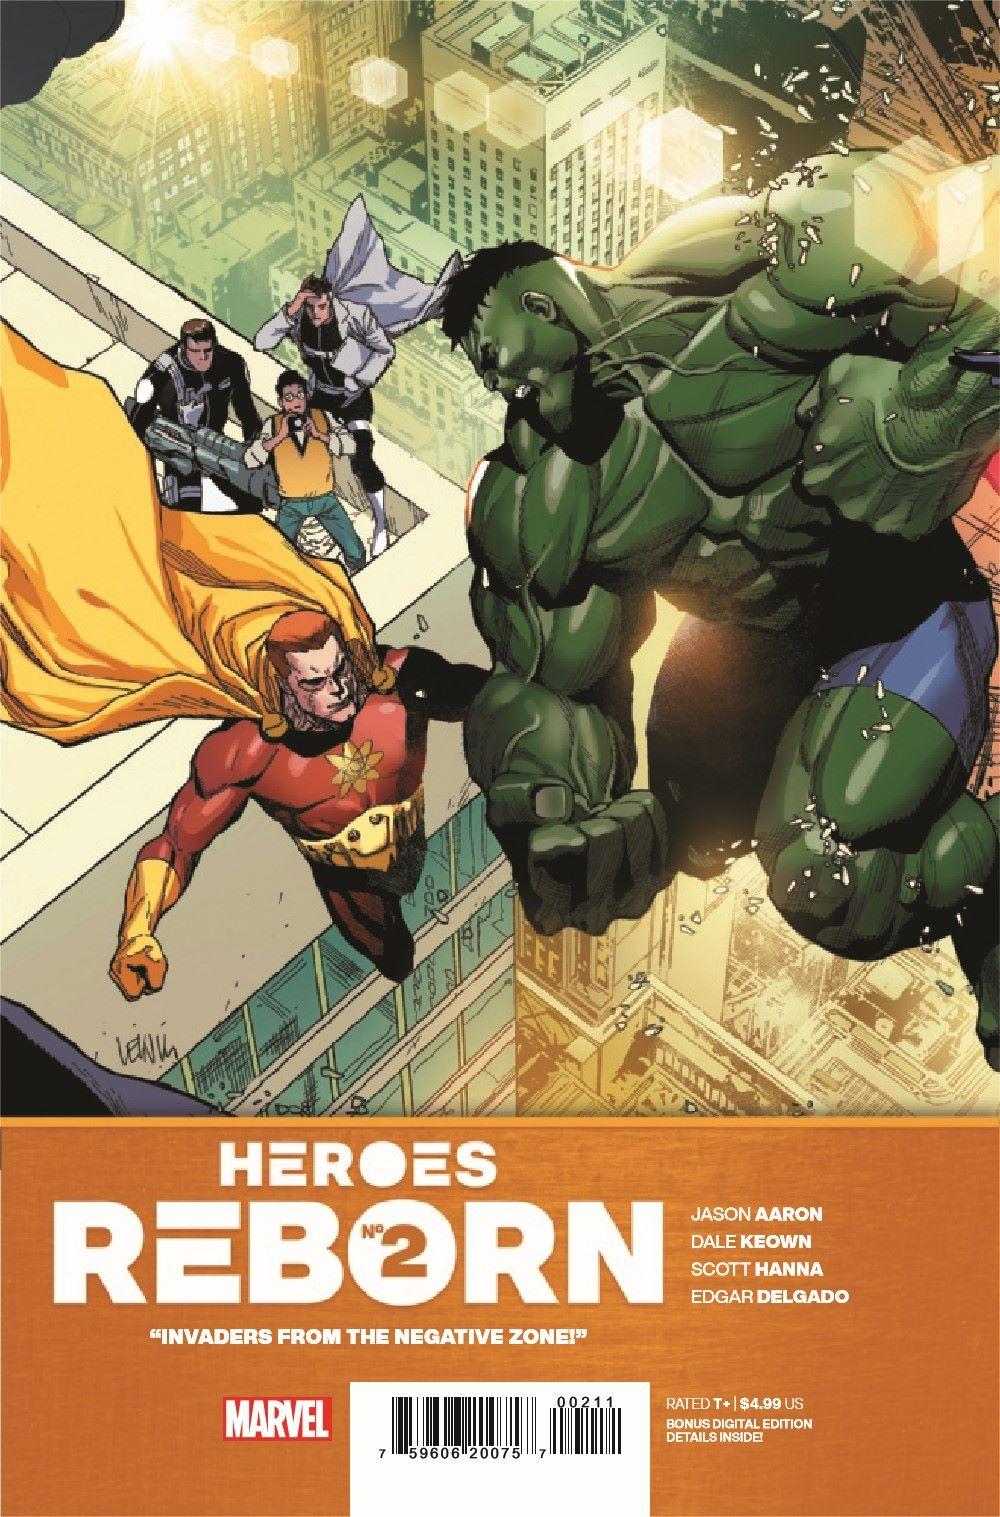 HEROESREBORN2021002_Preview-1 ComicList Previews: HEROES REBORN #2 (OF 7)